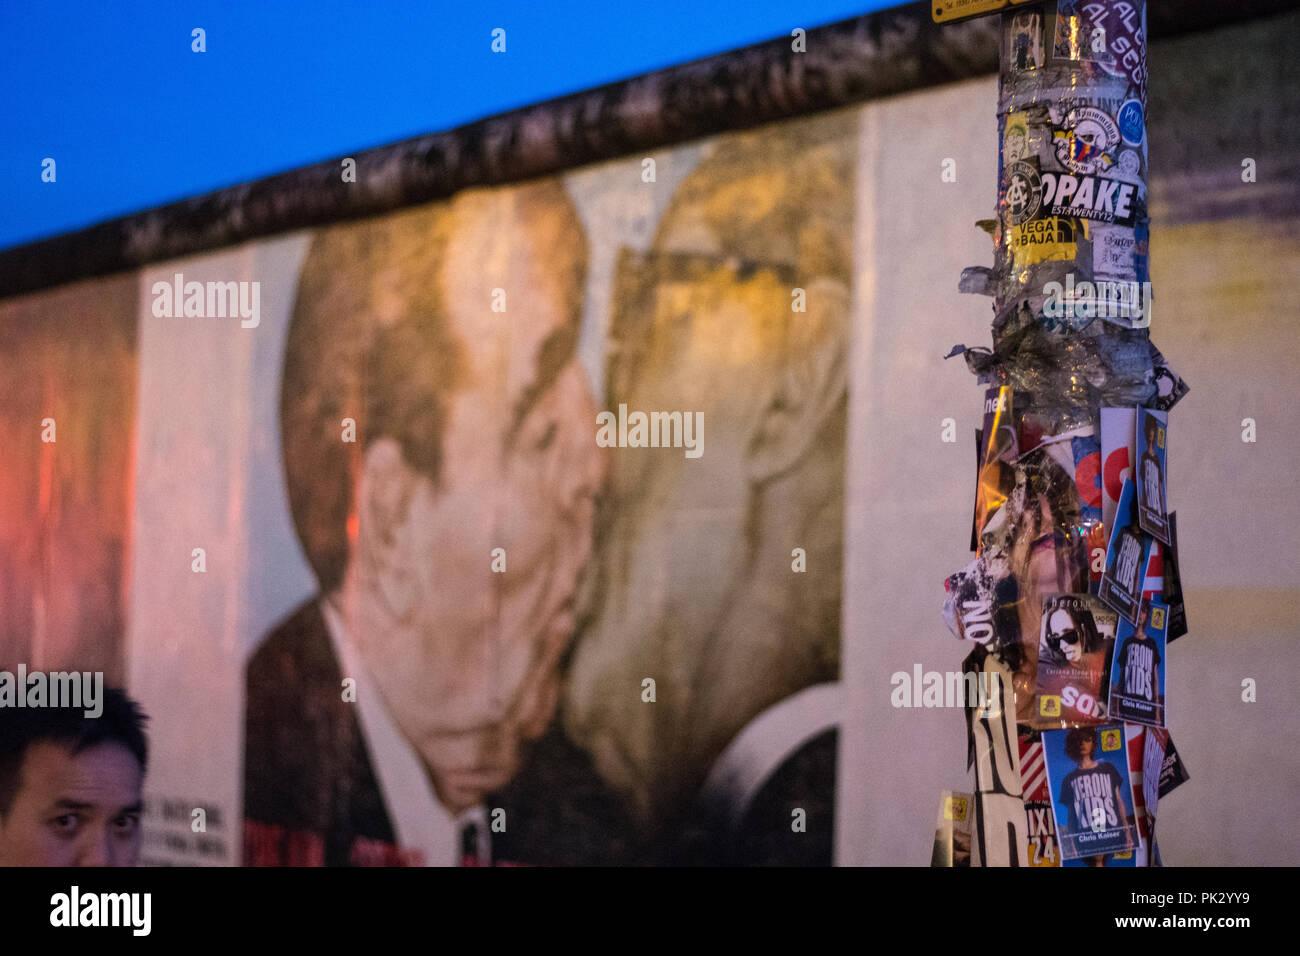 East side gallery love president, Berlin east - Stock Image